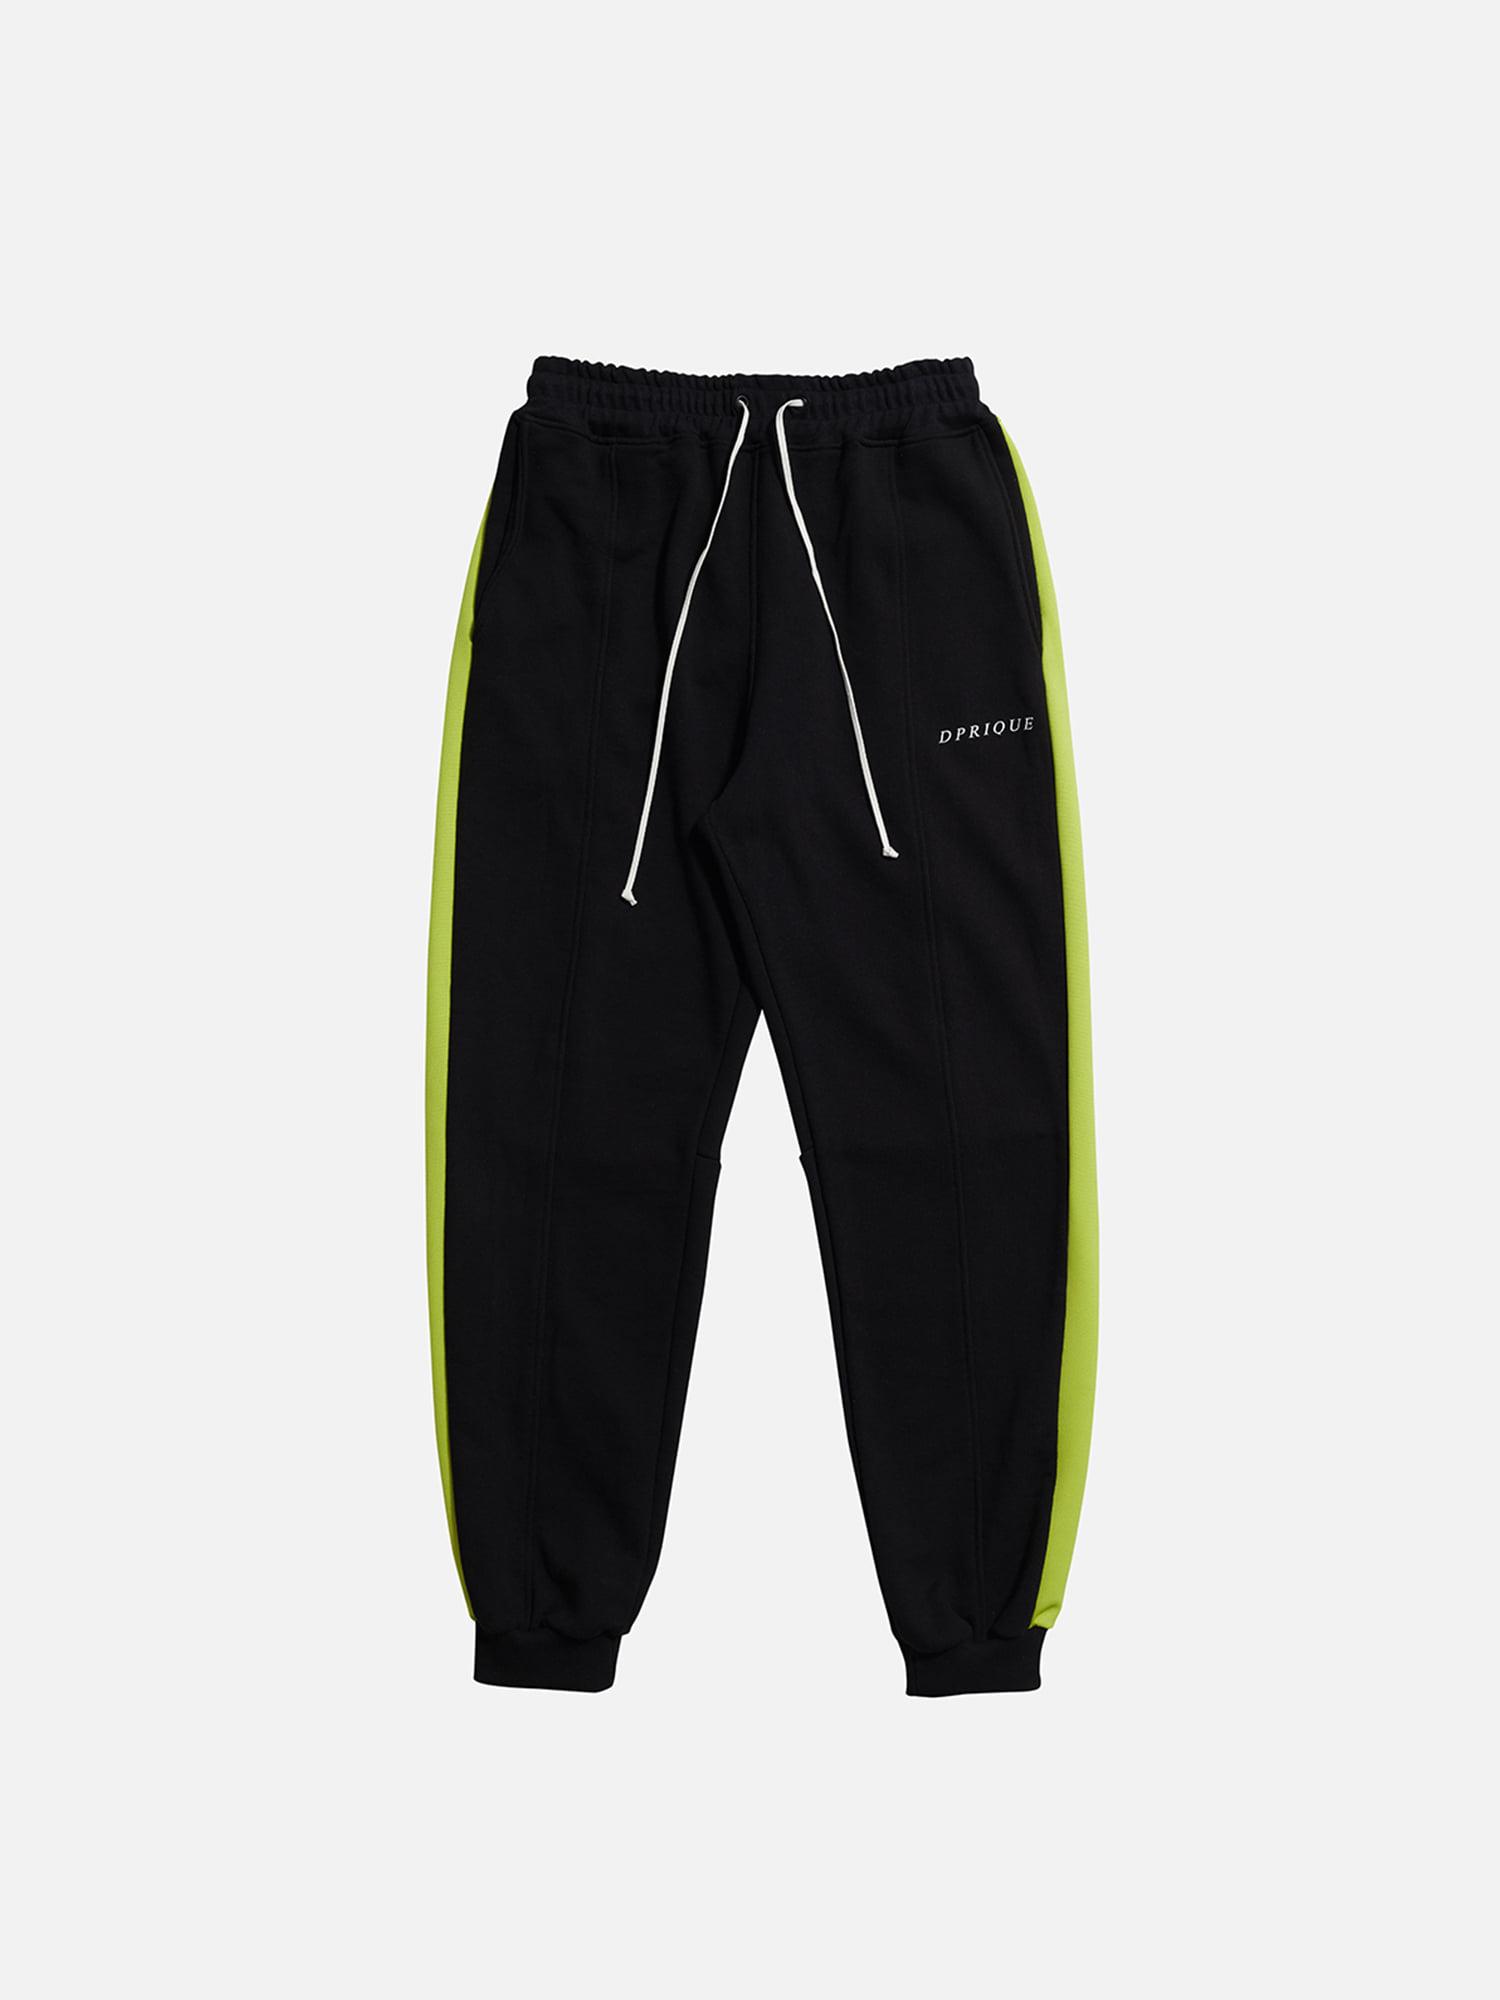 07 Track Jogger Pants - Black/Neon